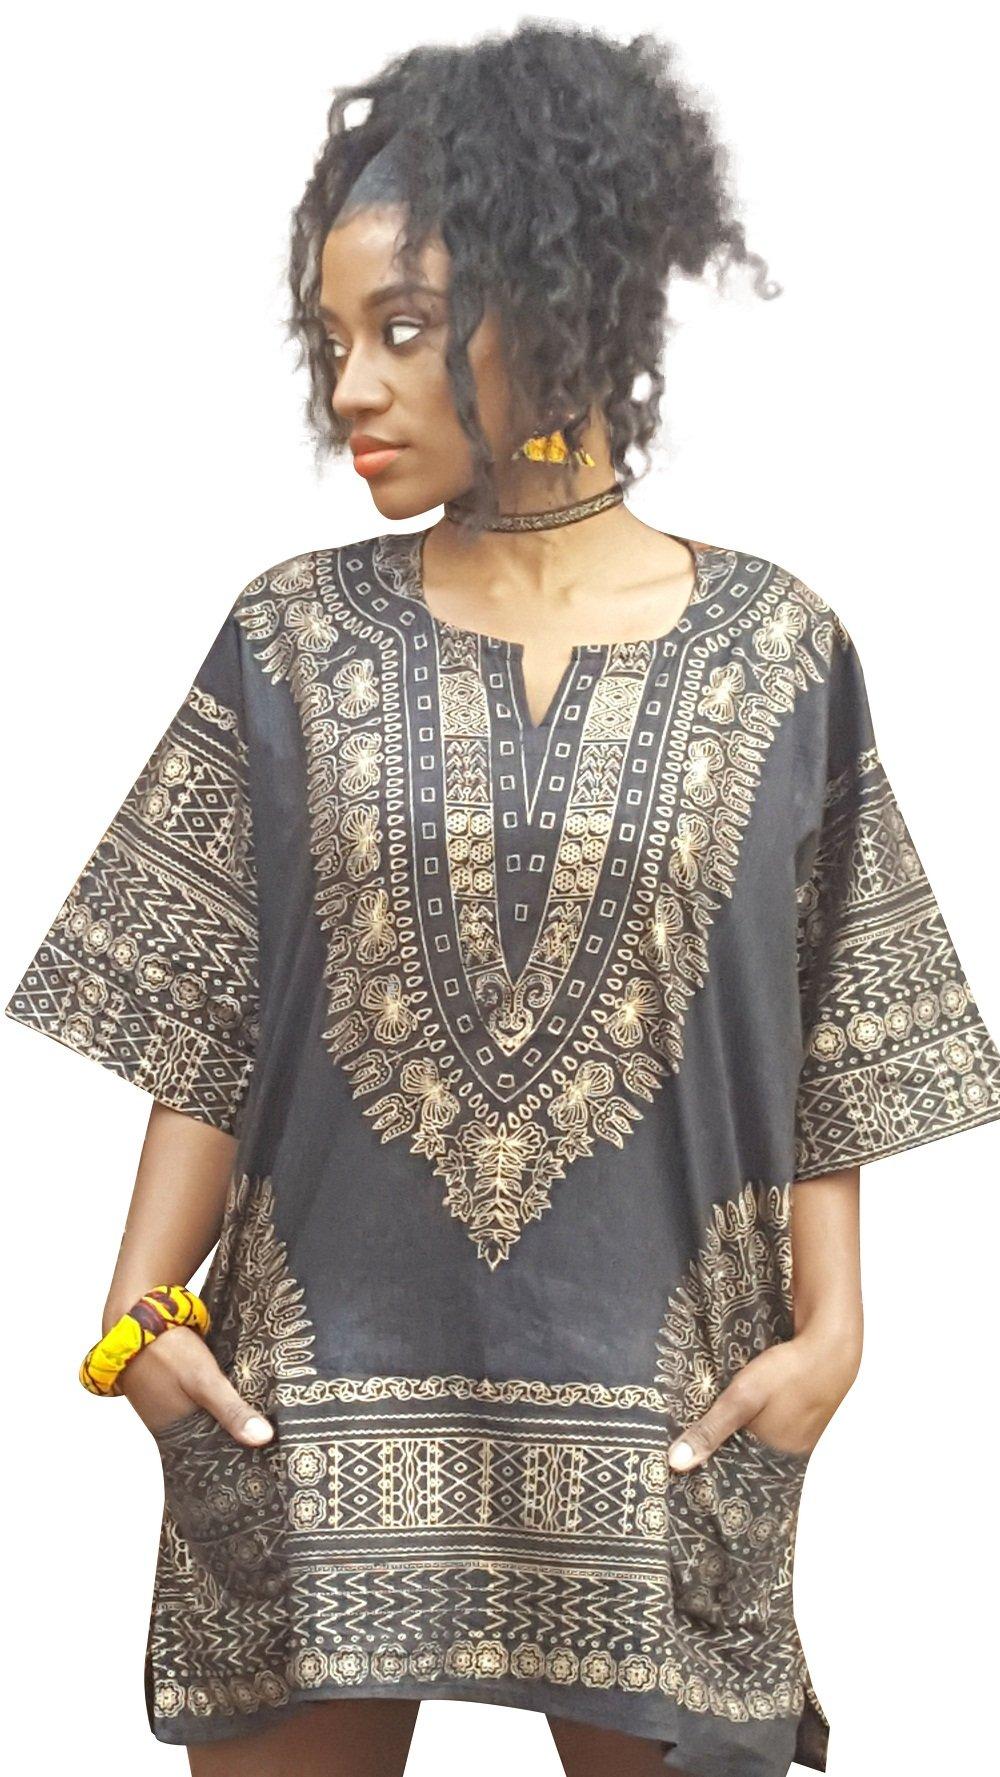 Black and Gold Traditional African Dashiki Shirt (Large)